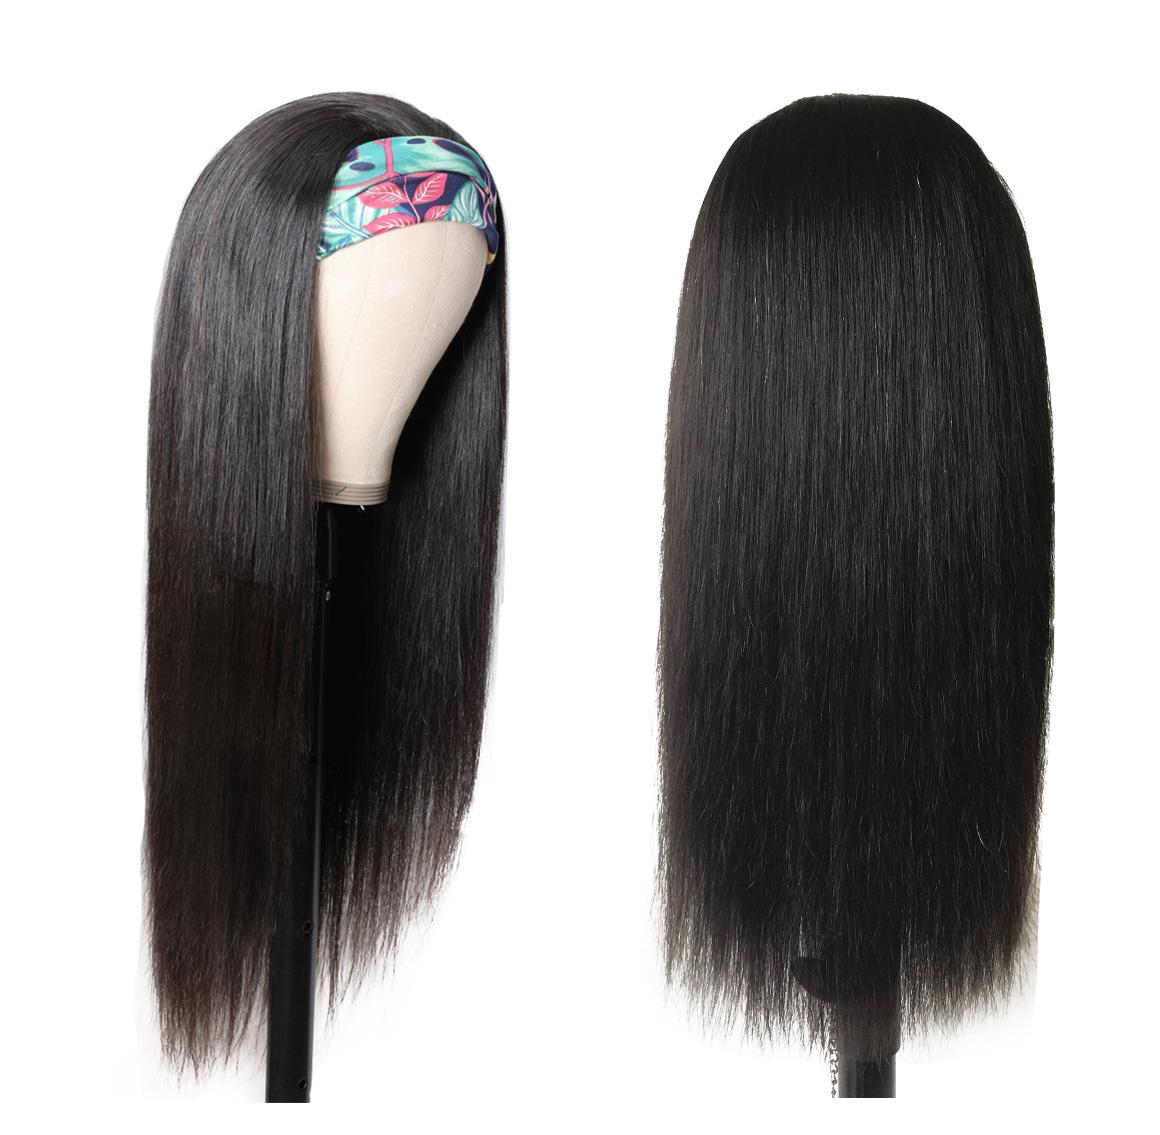 straight hair wig with glueless headband